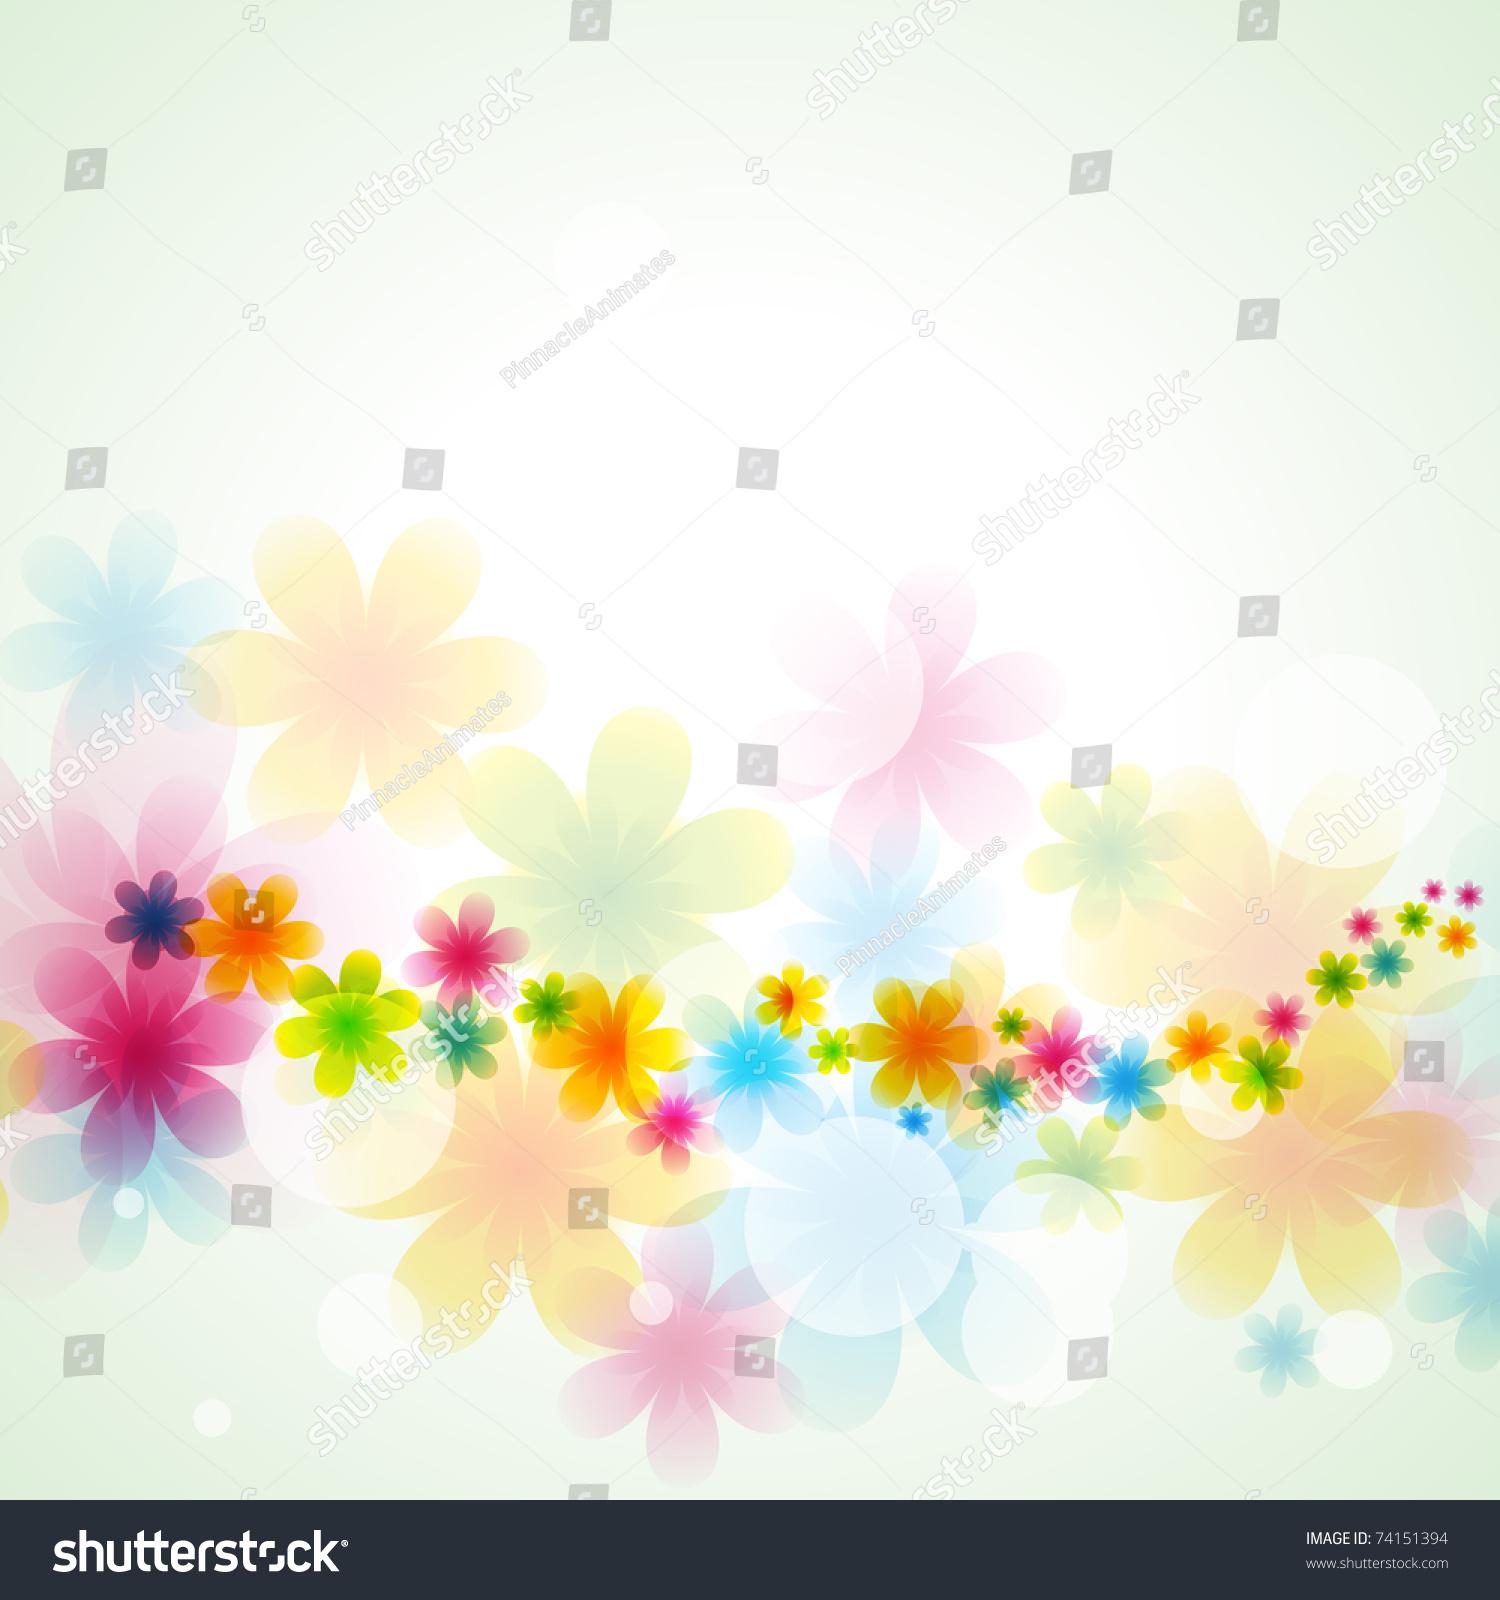 Beautiful Flower Vector Background Illustration Stock